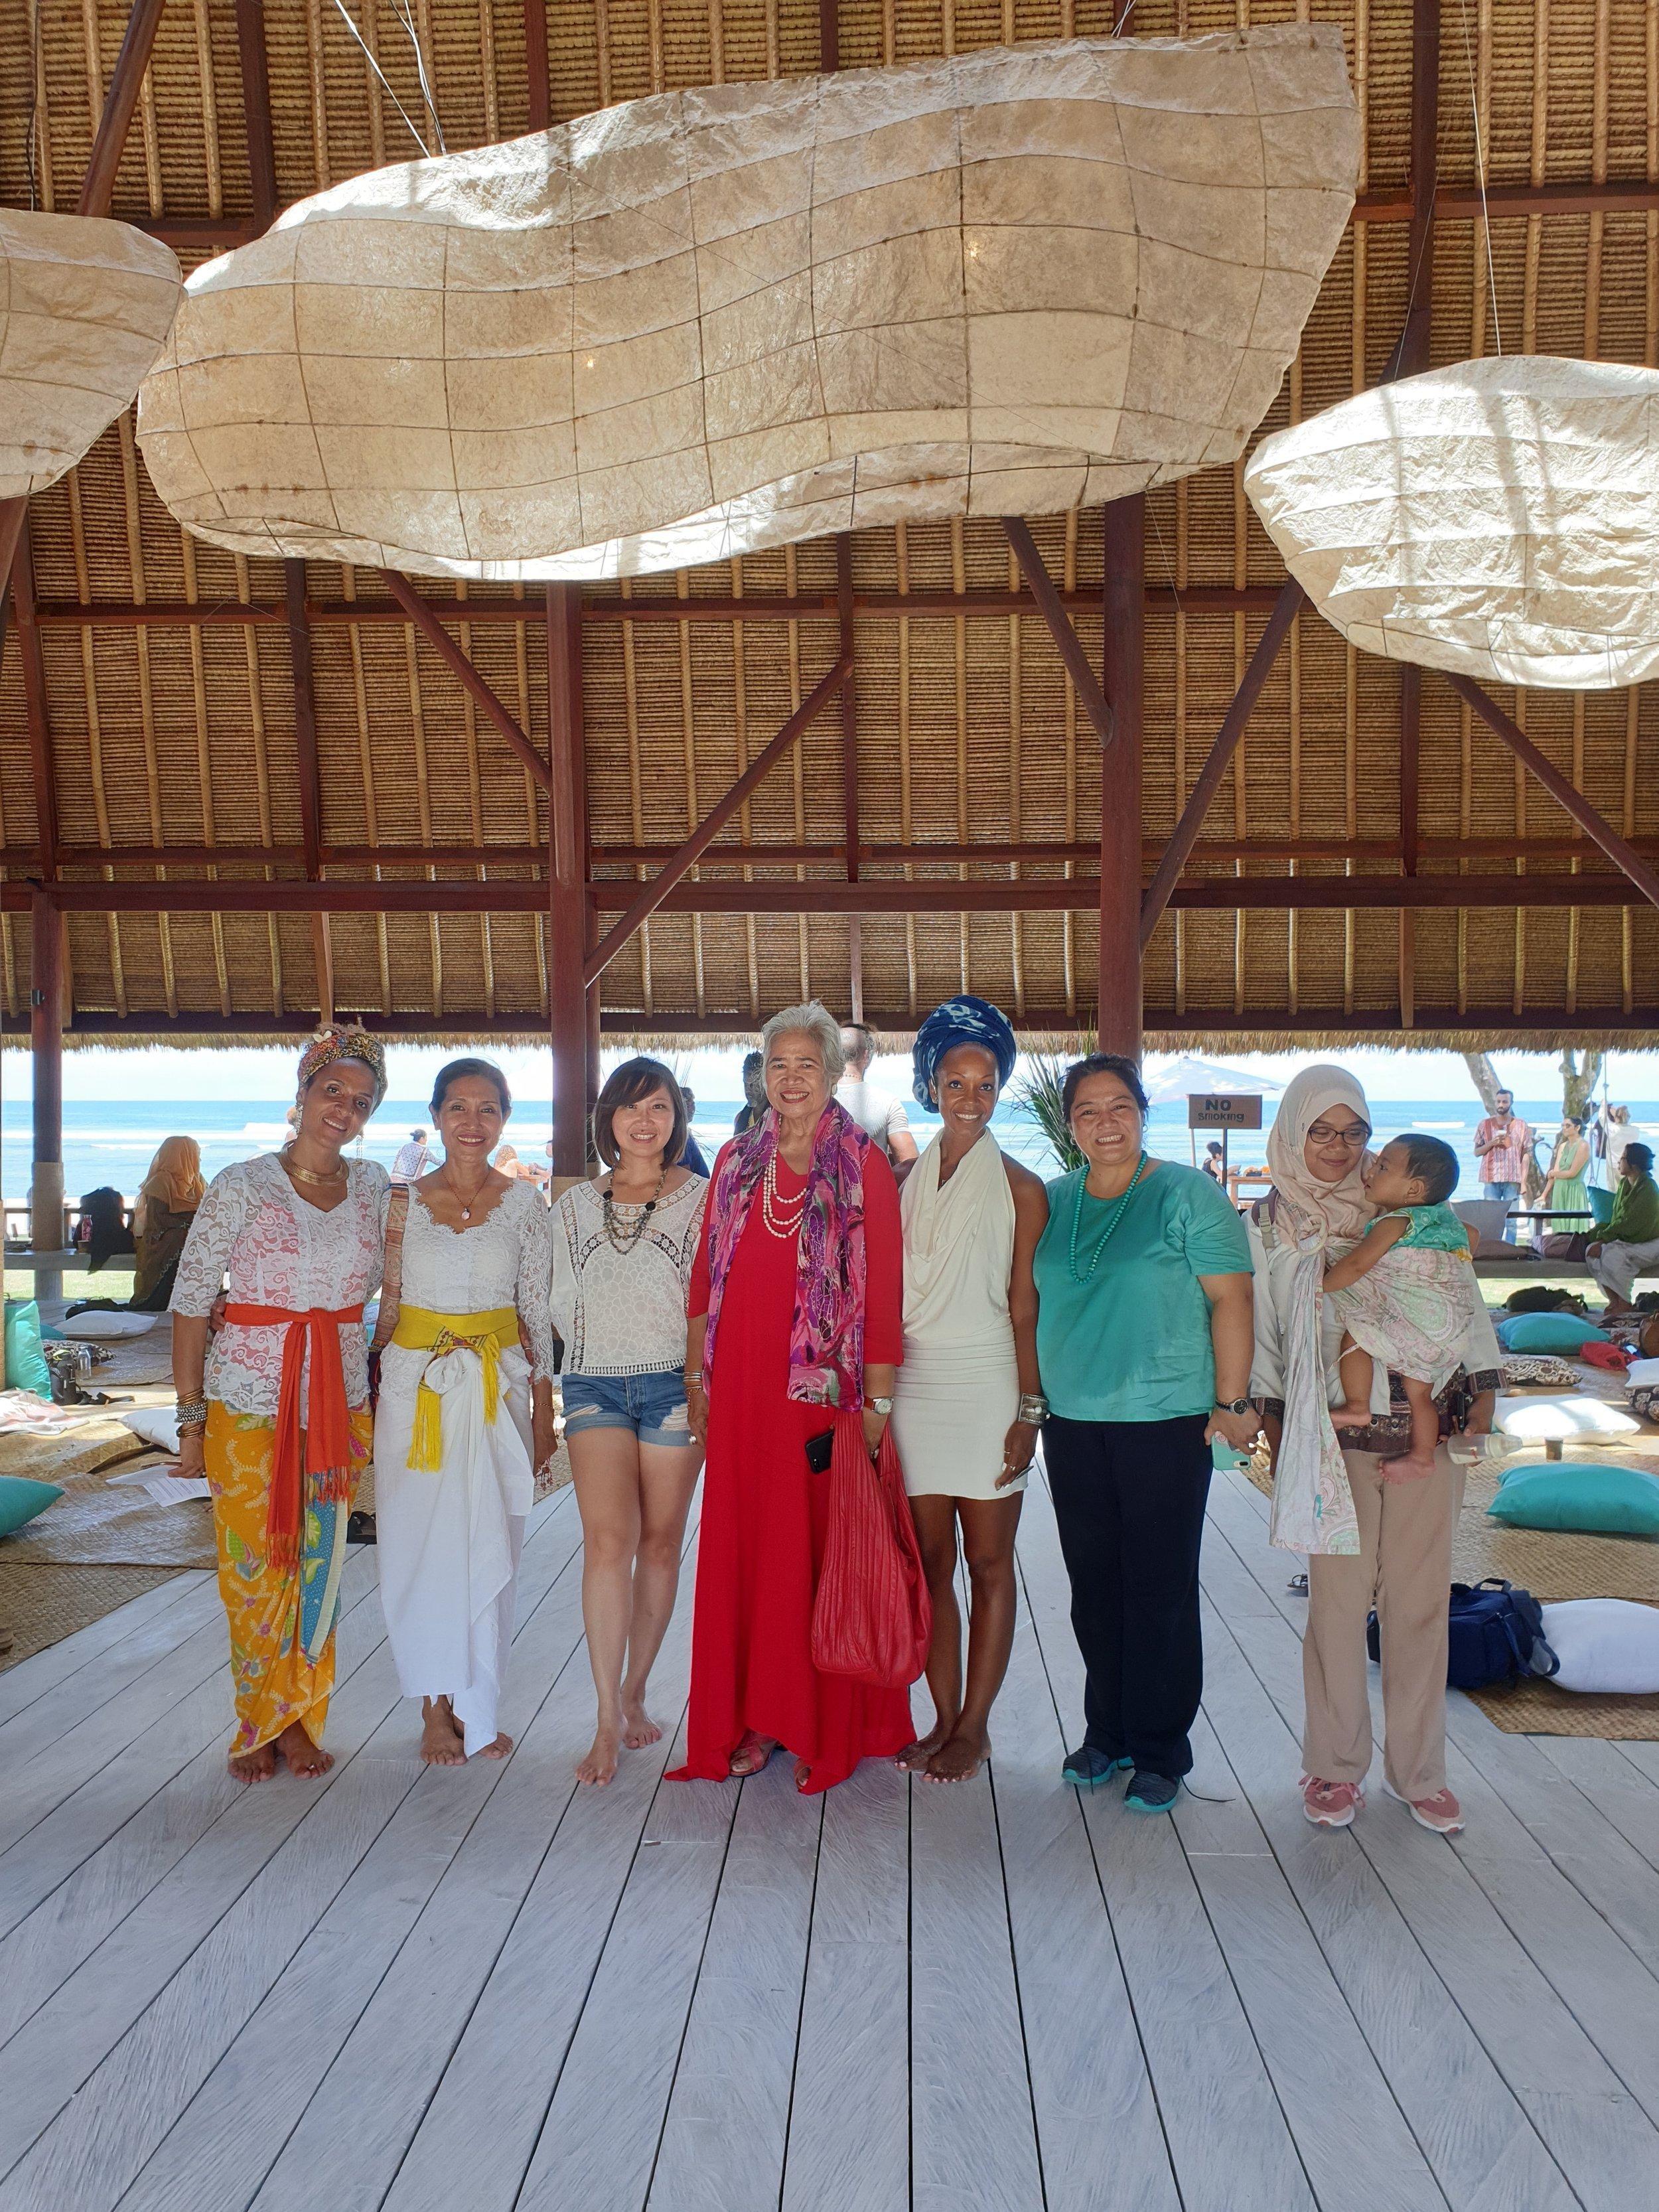 The Kura Kura Bali Team, Venue Sponsors